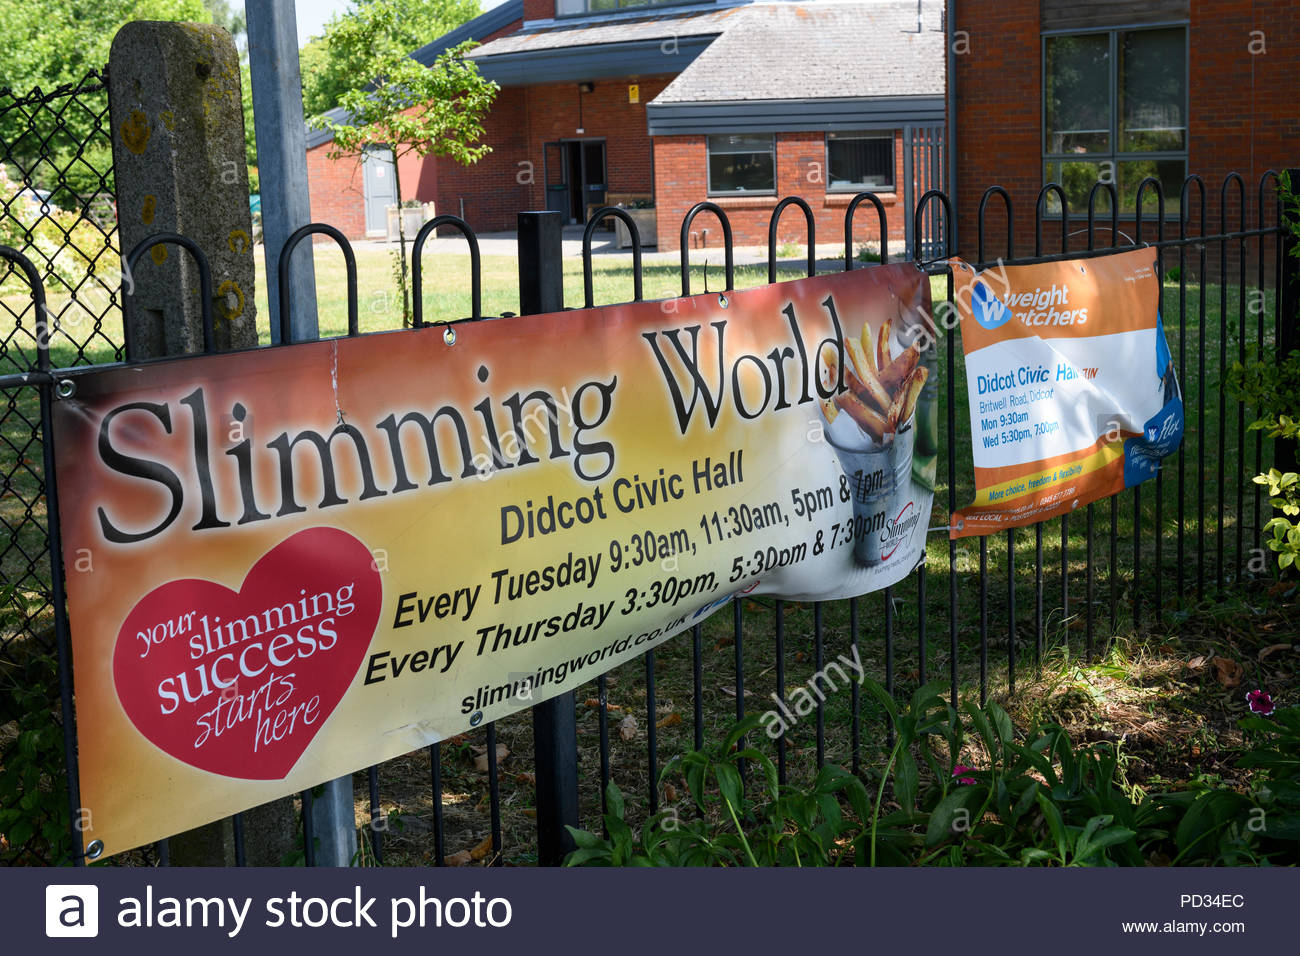 Slimming World venue poster, Didcot, Berkshire, England, UK - Stock Image